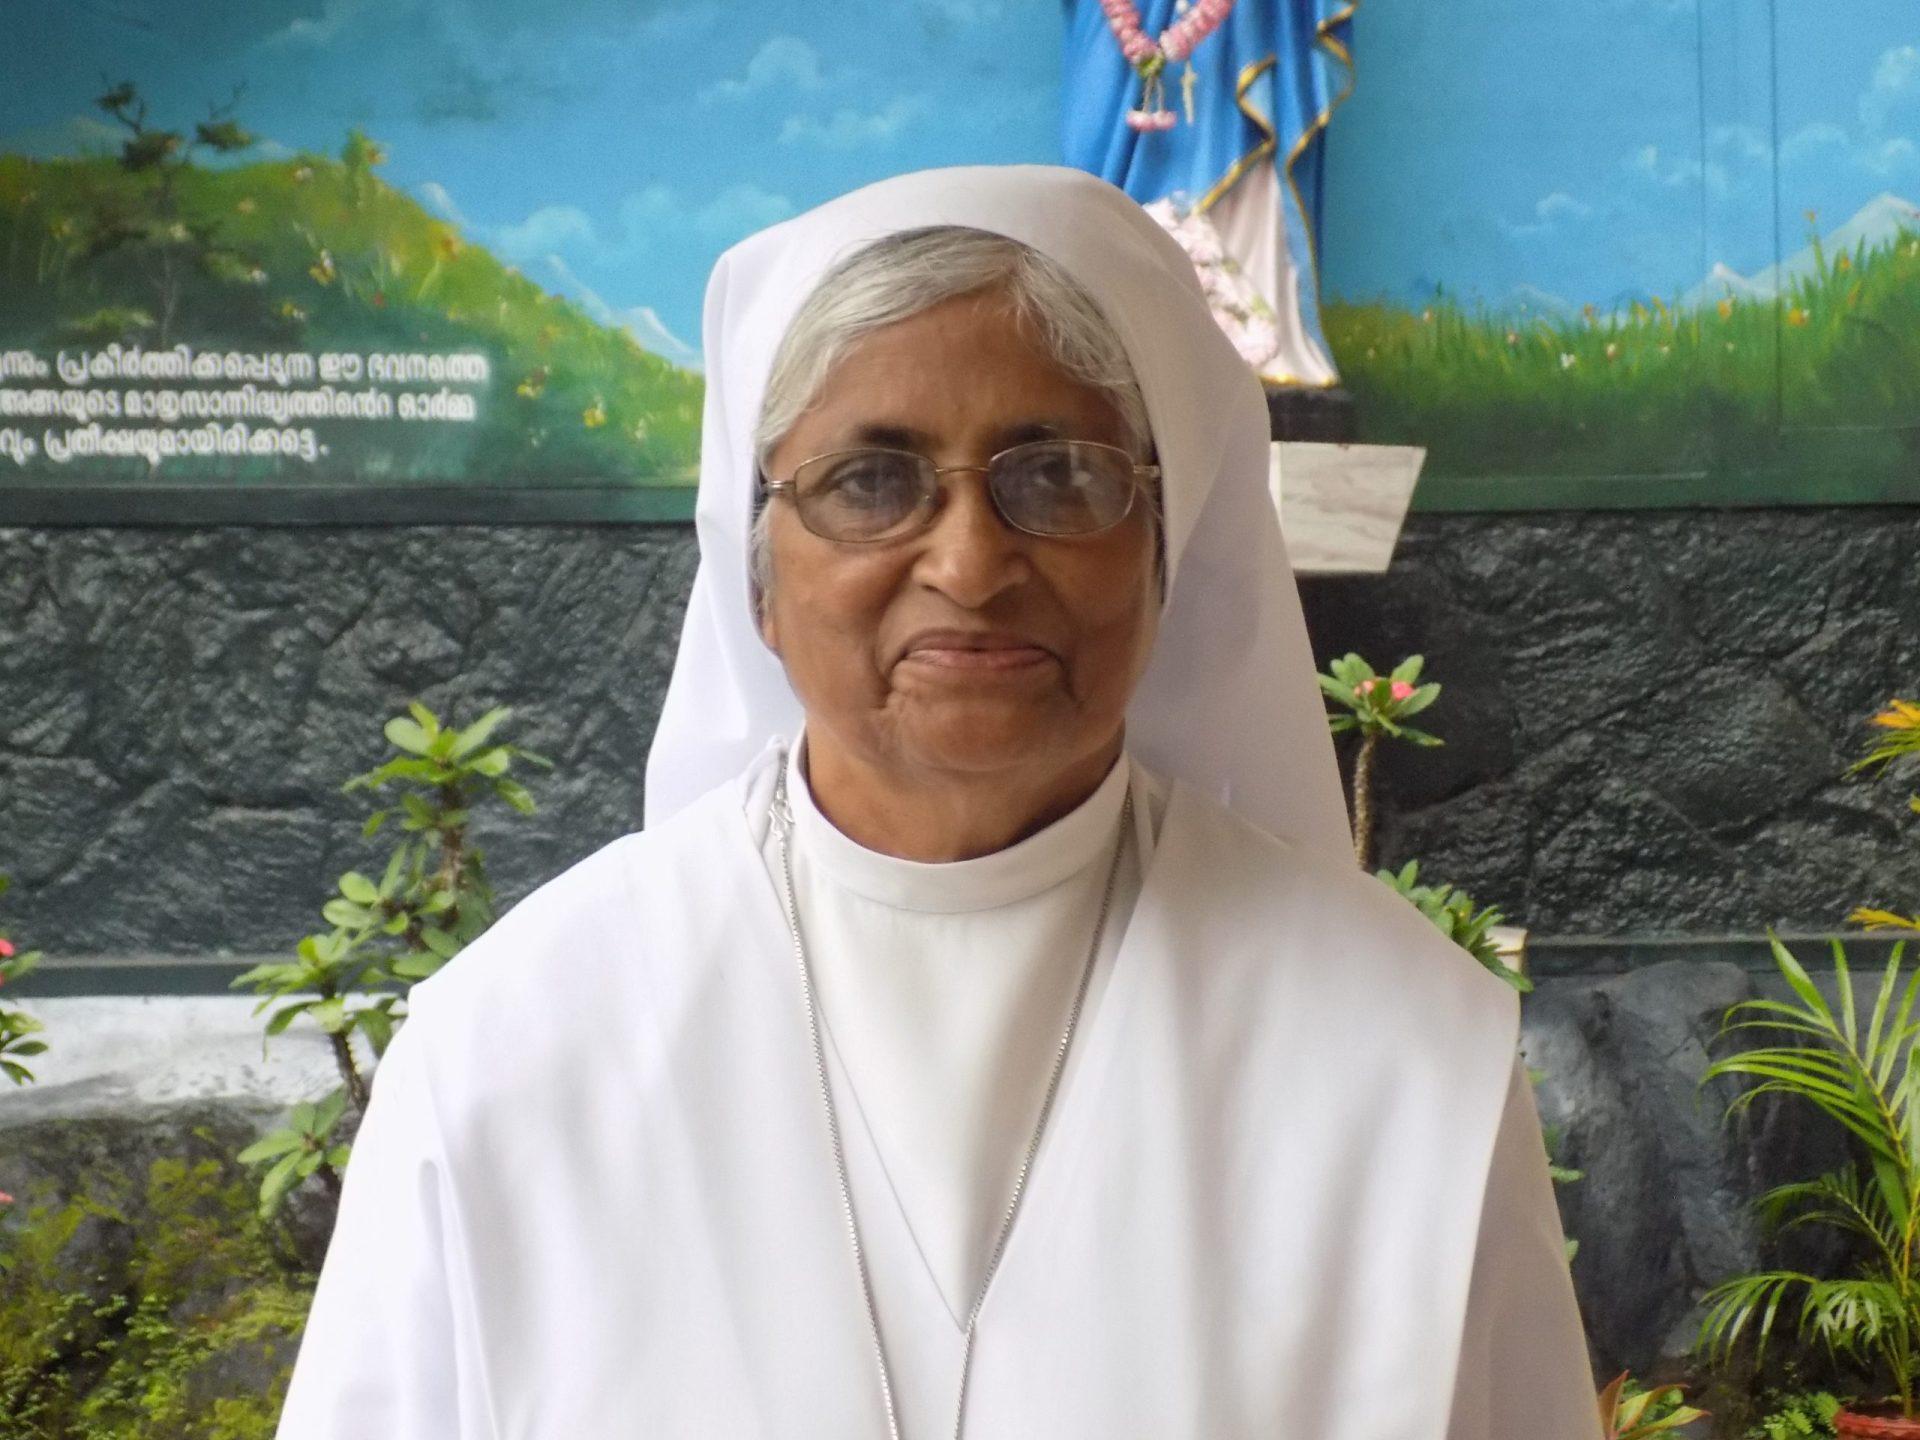 Sr. Cecily Kuruthukulangara